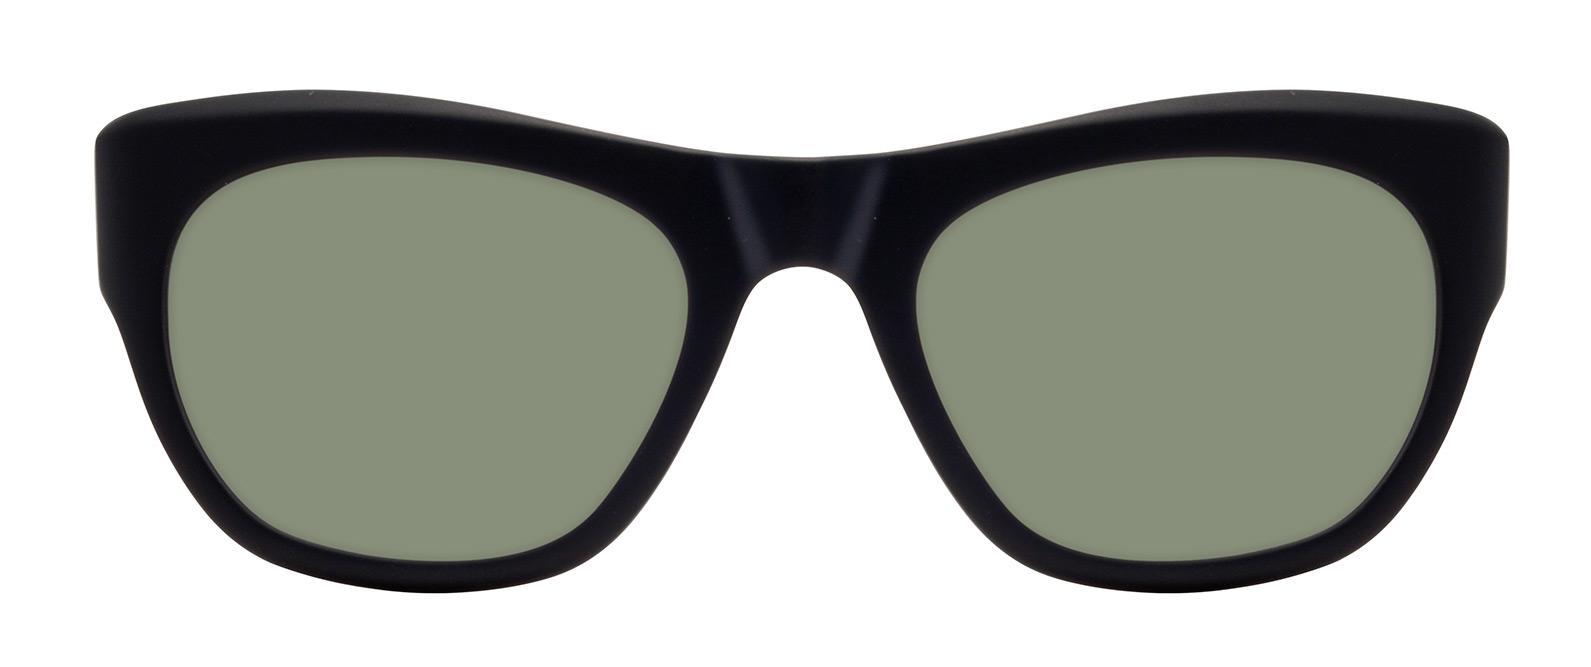 moscot-eyewear-ss2013-27